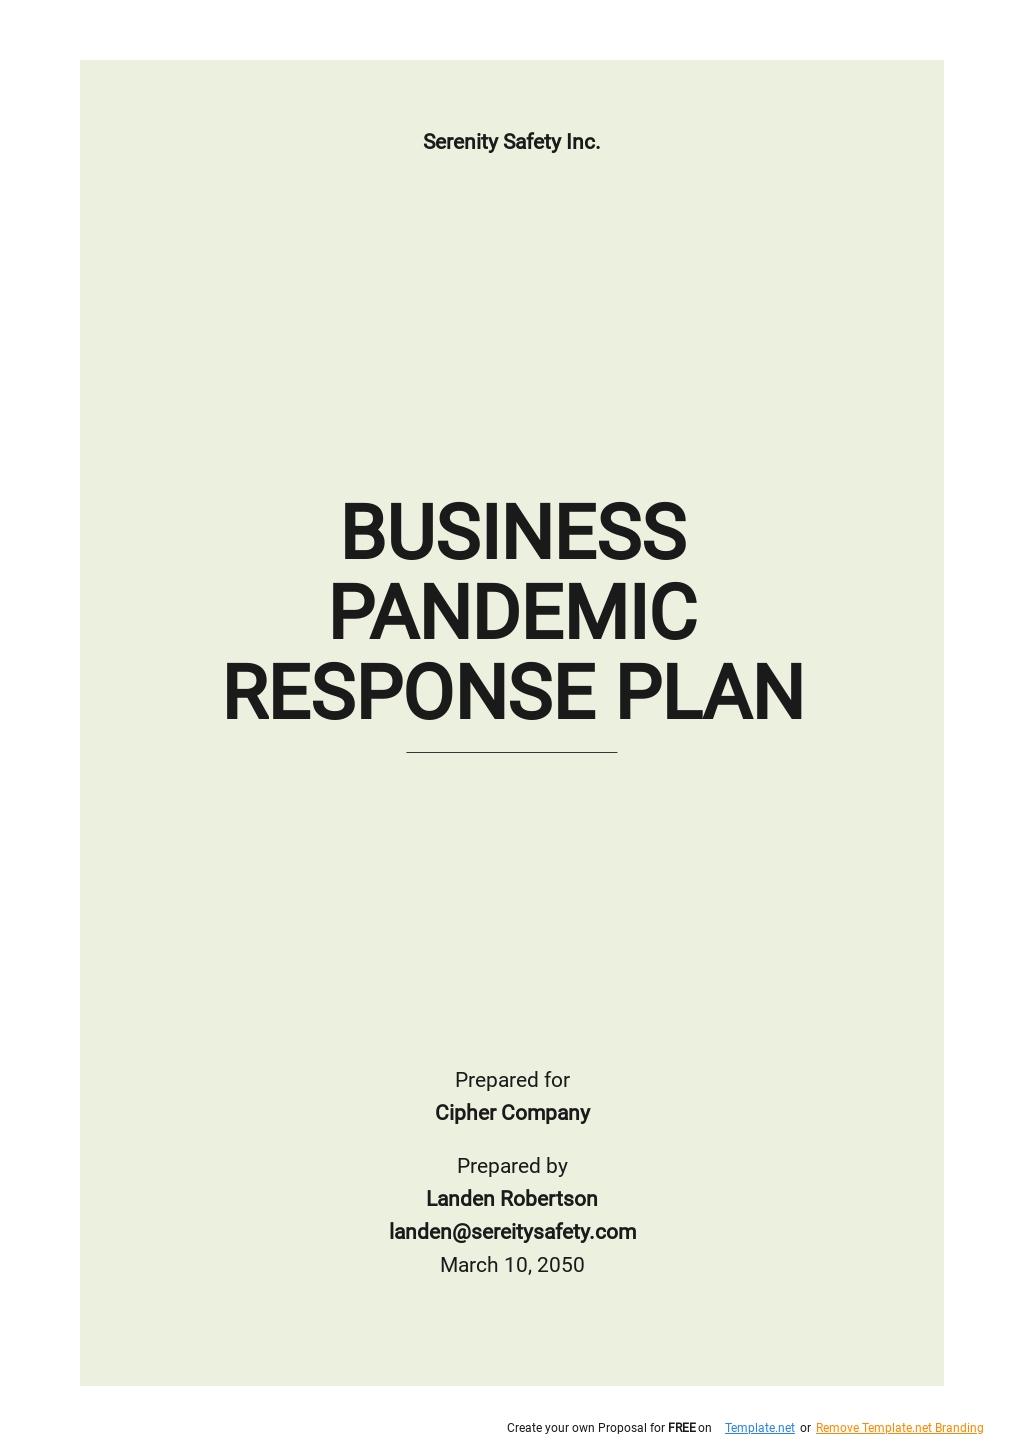 Business Pandemic Response Plan Template.jpe